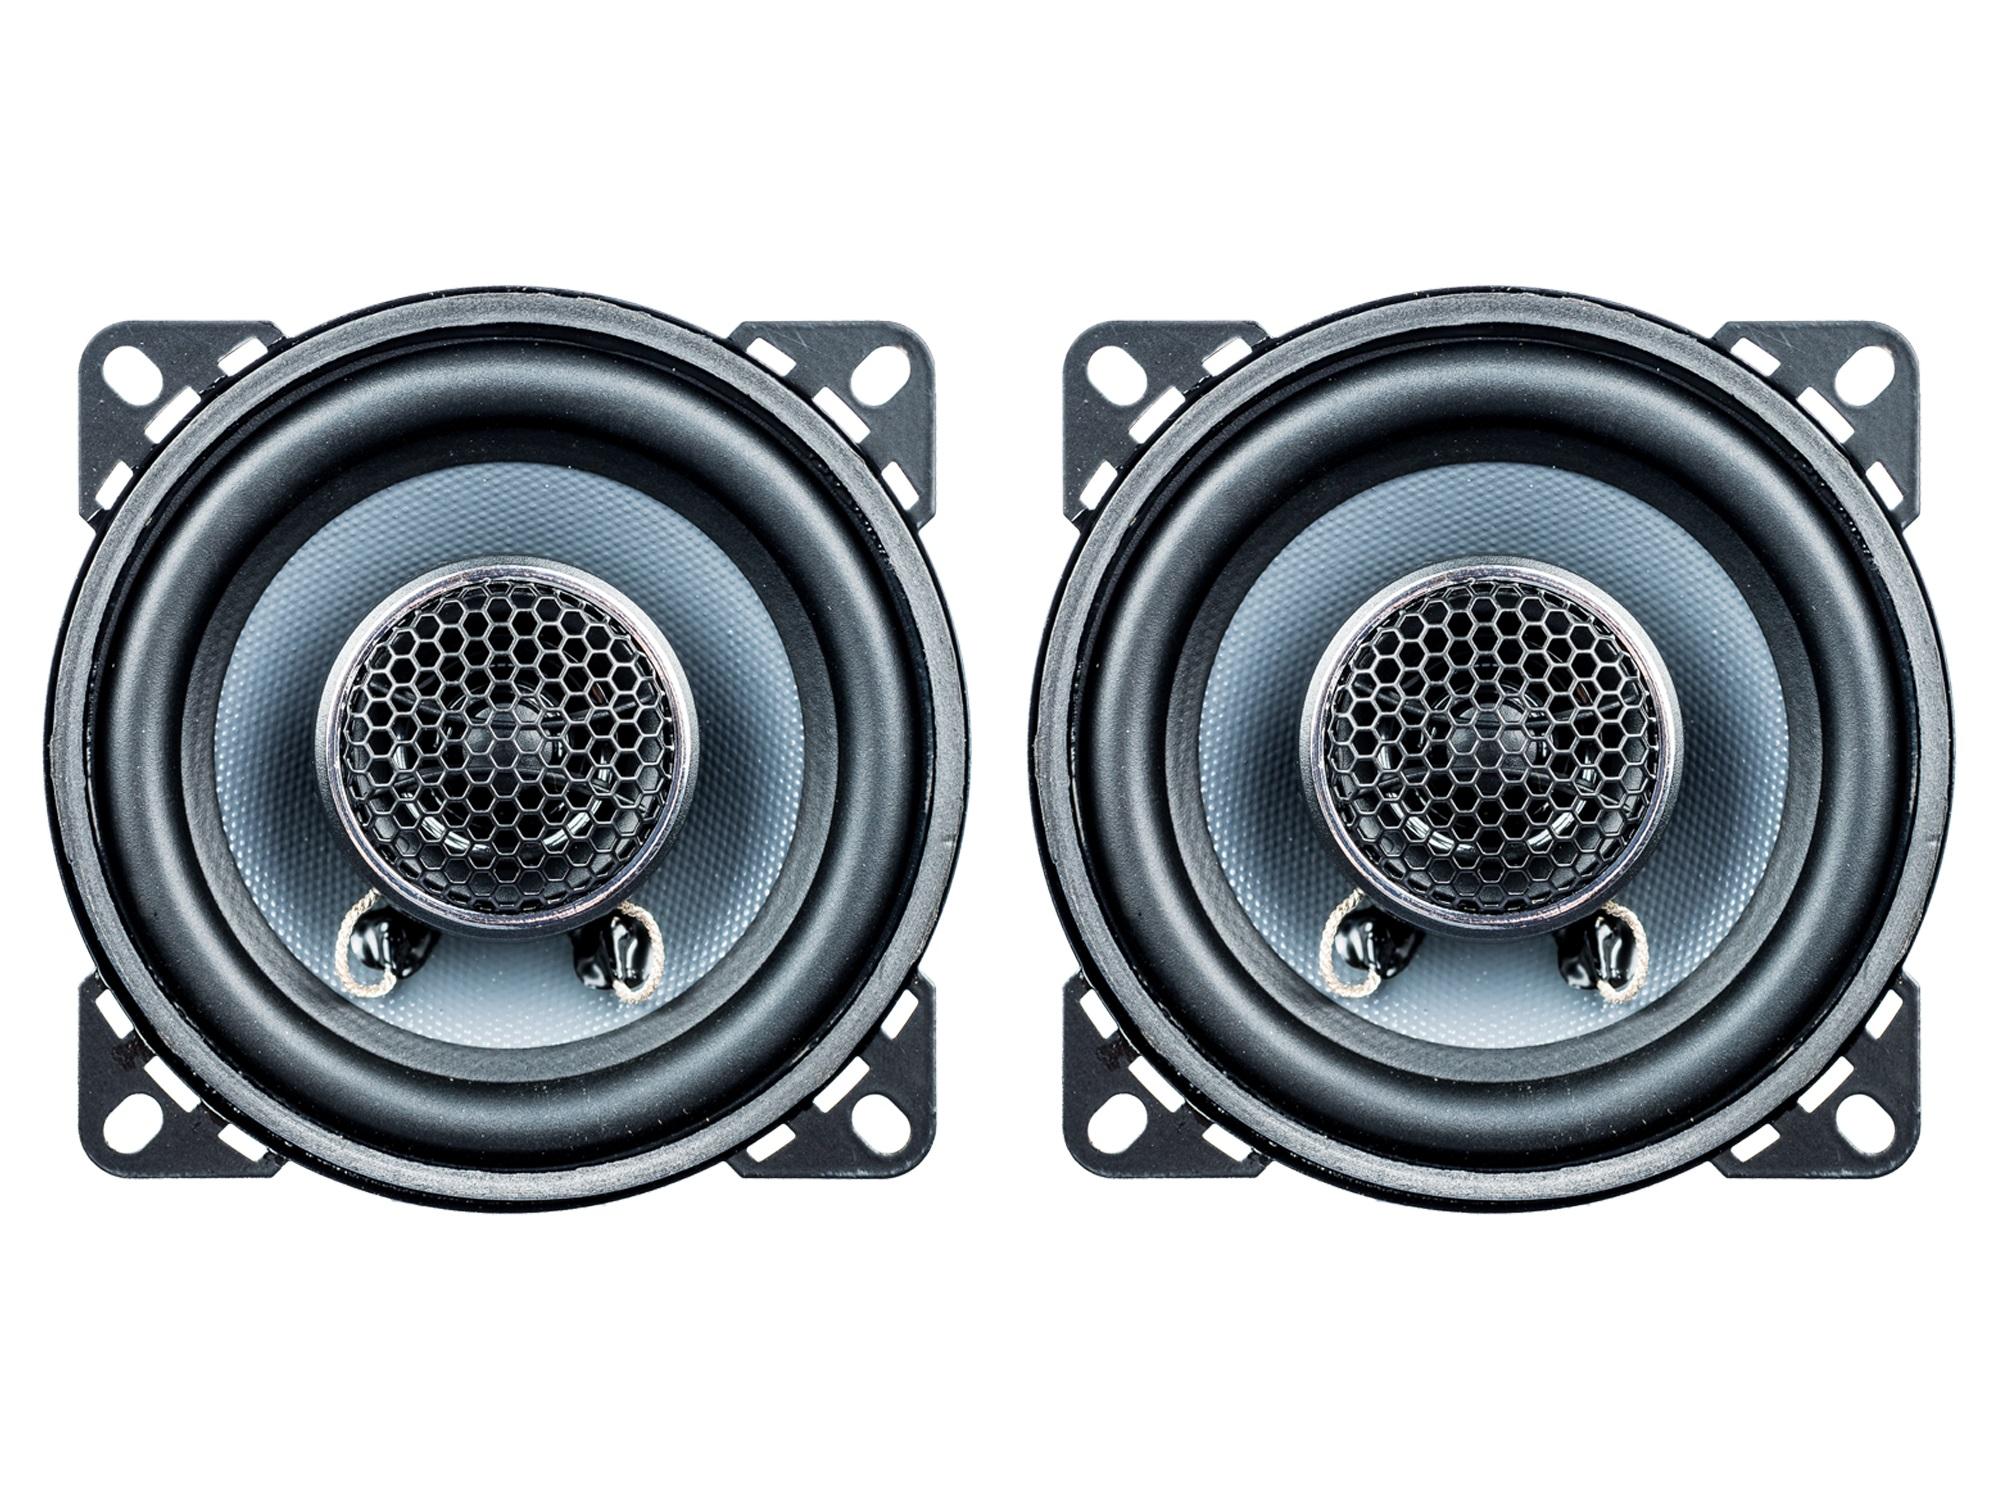 PG Audio EVO III 10.2, 2-Wege Koax passend für Alfa,Fiat & Lancia Modelle 001